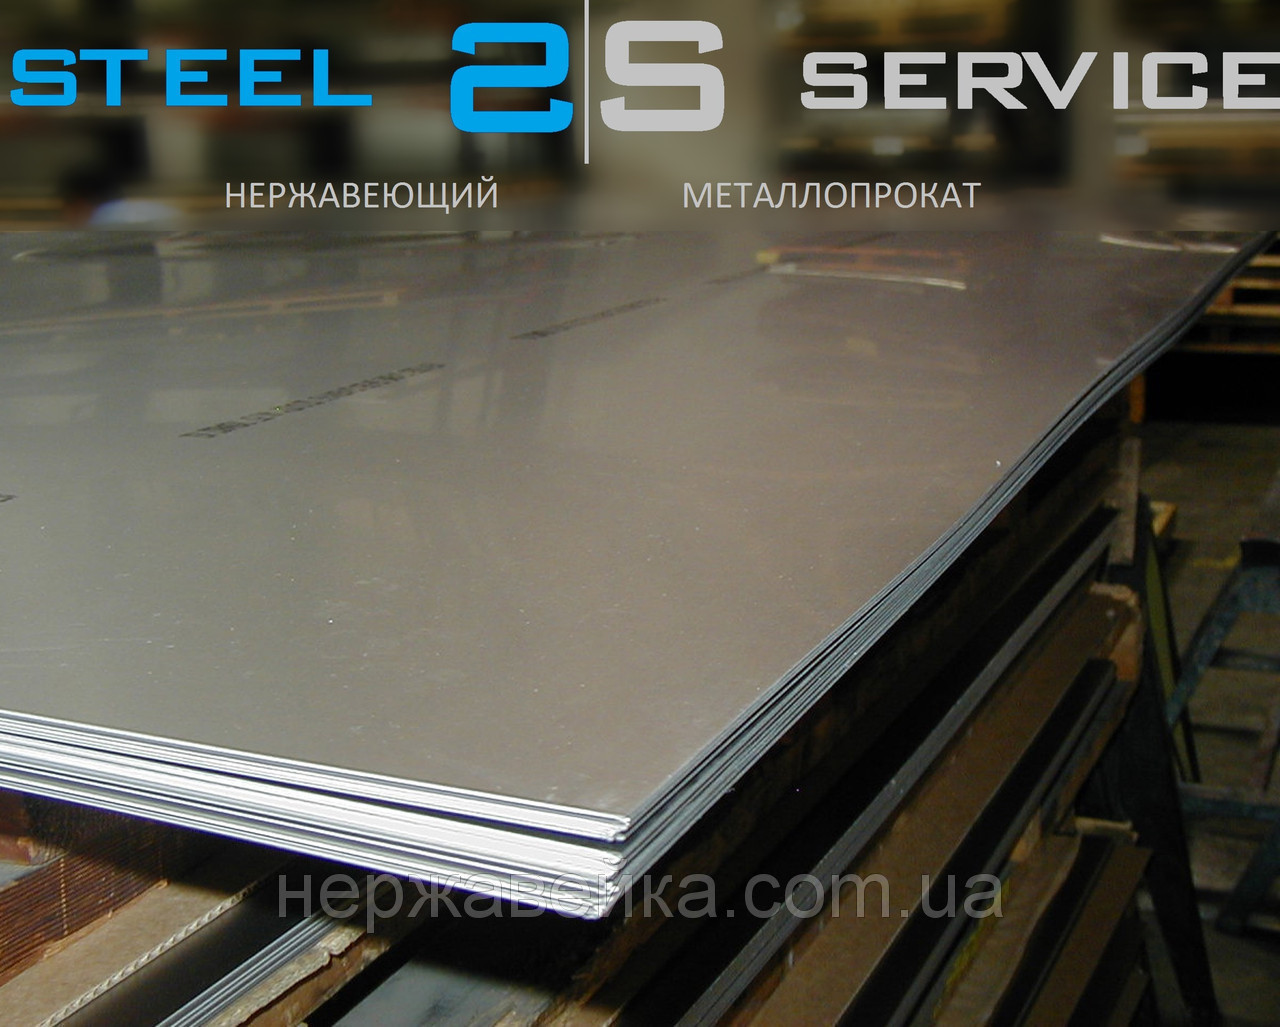 Нержавейка лист 0,8х1250х2500мм  AISI 316L(03Х17Н14М3) 2B - матовый,  кислотостойкий